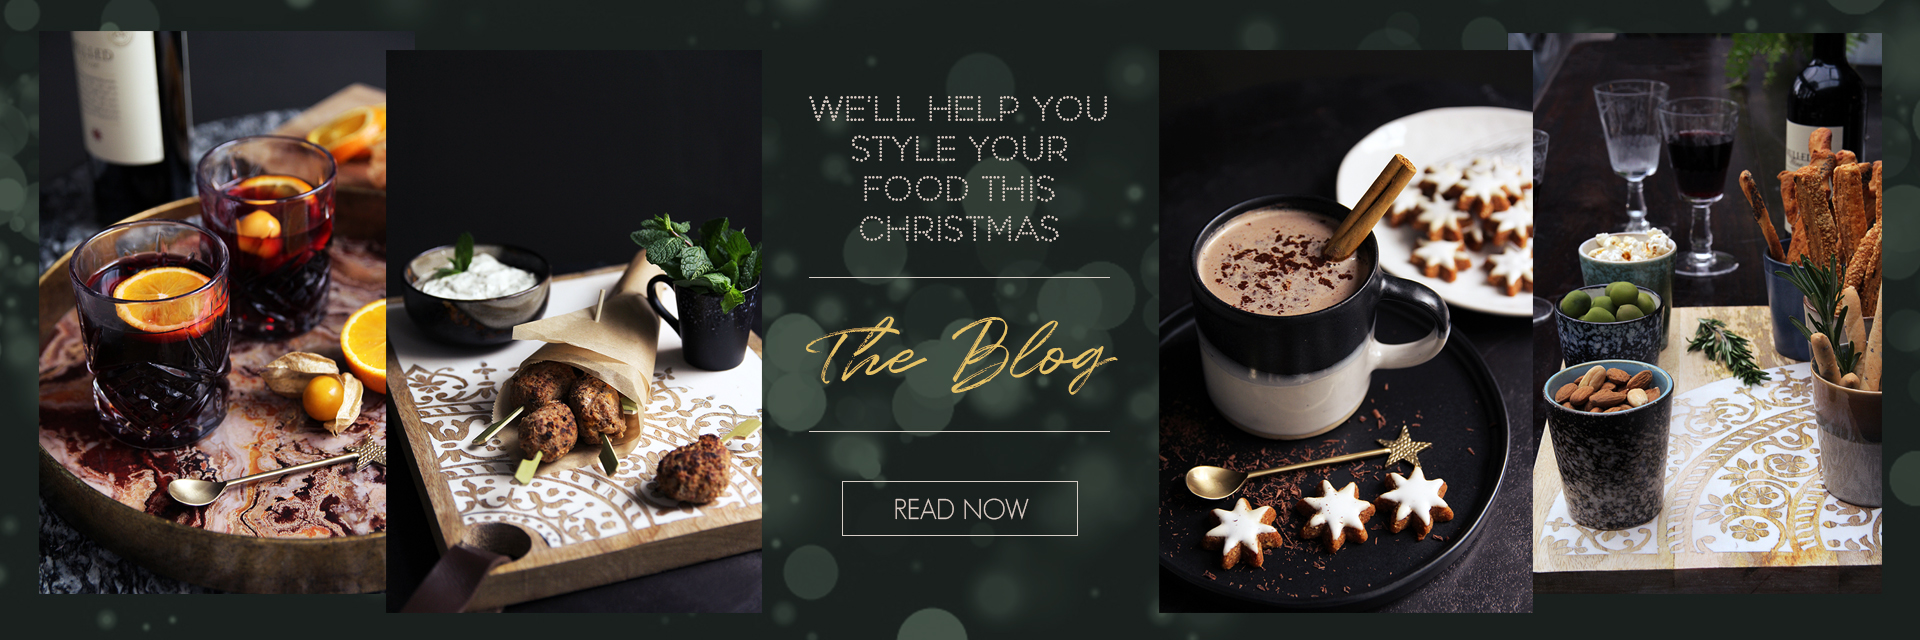 5 BEST CHEATS FOR CHRISTMAS ENTERTAINING